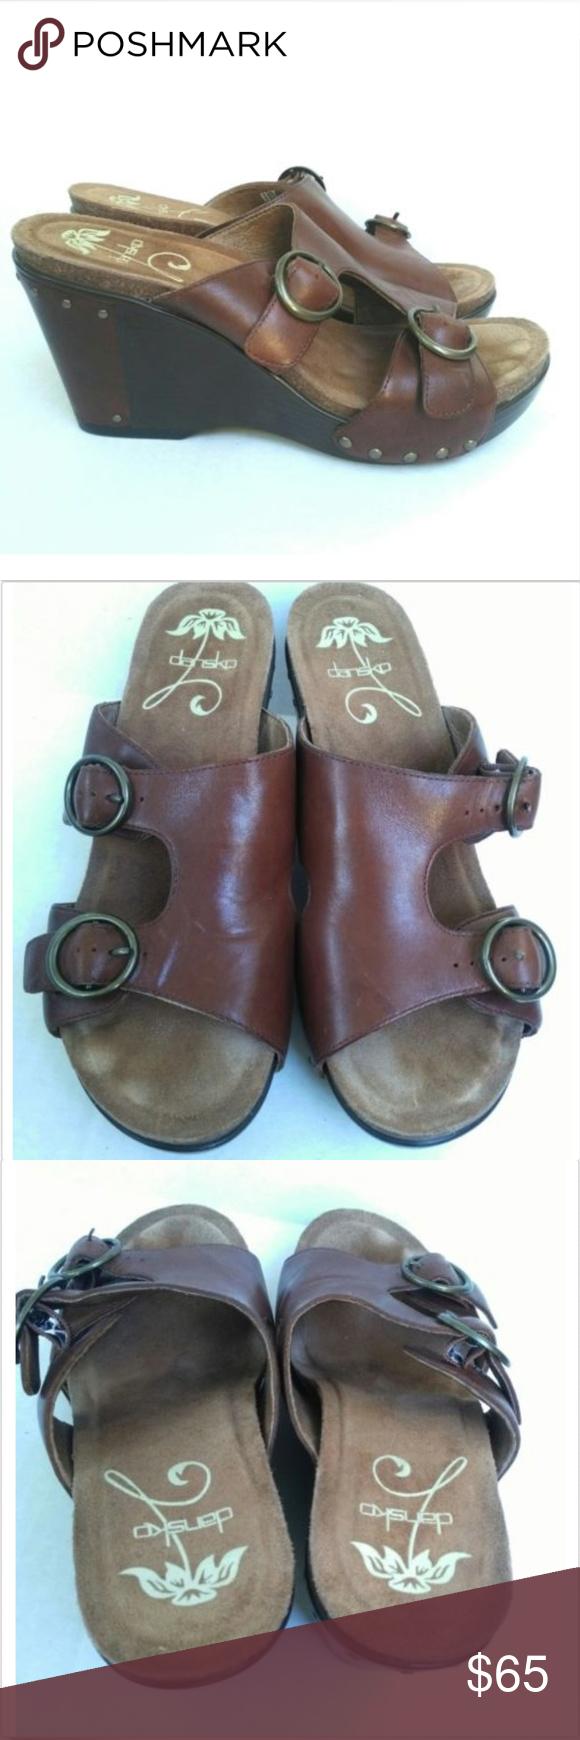 9420c7323af DANSKO Fern Antique Brandy Brown Leather Sandals DANSKO Womens Fern Antique  Brandy Brown Leather Wedge Sandals Sz 40 9.5-10 Good used condition.